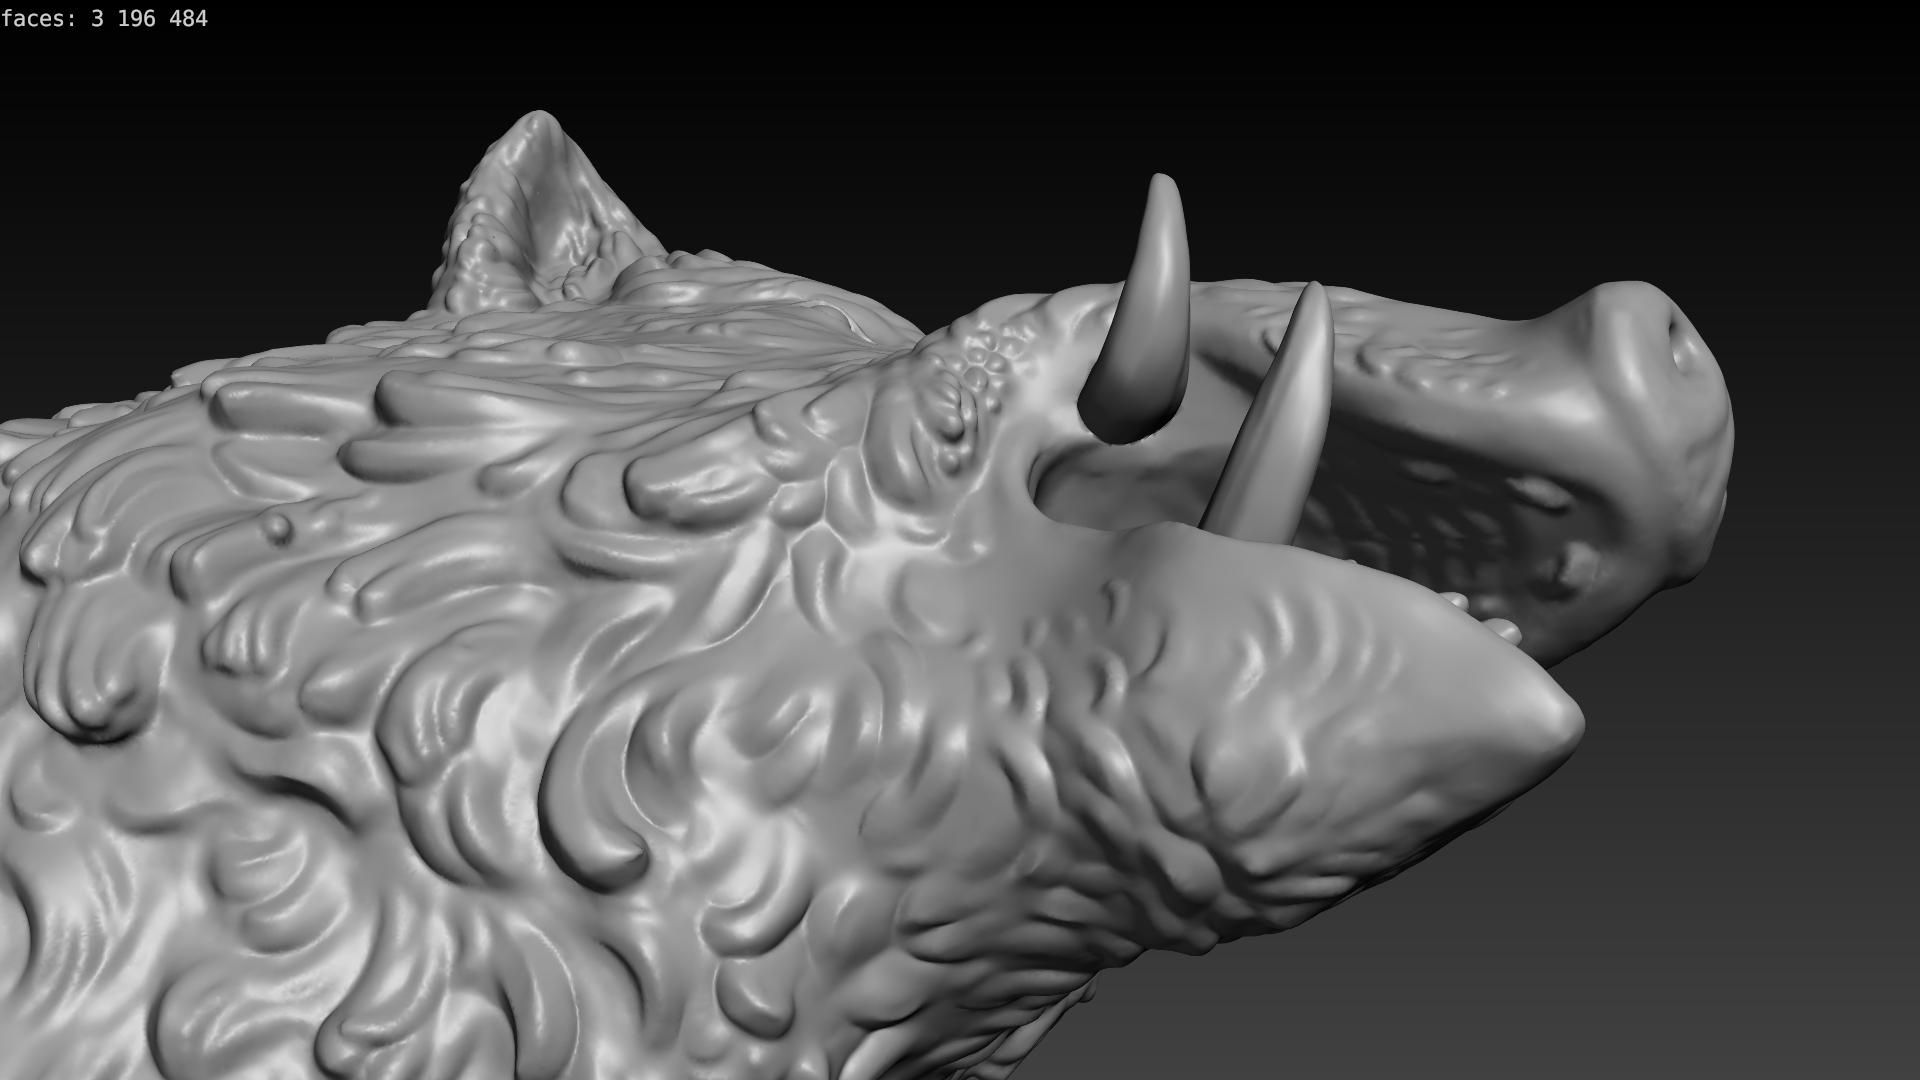 boar-09.png Download STL file Boar • 3D printable design, Skazok